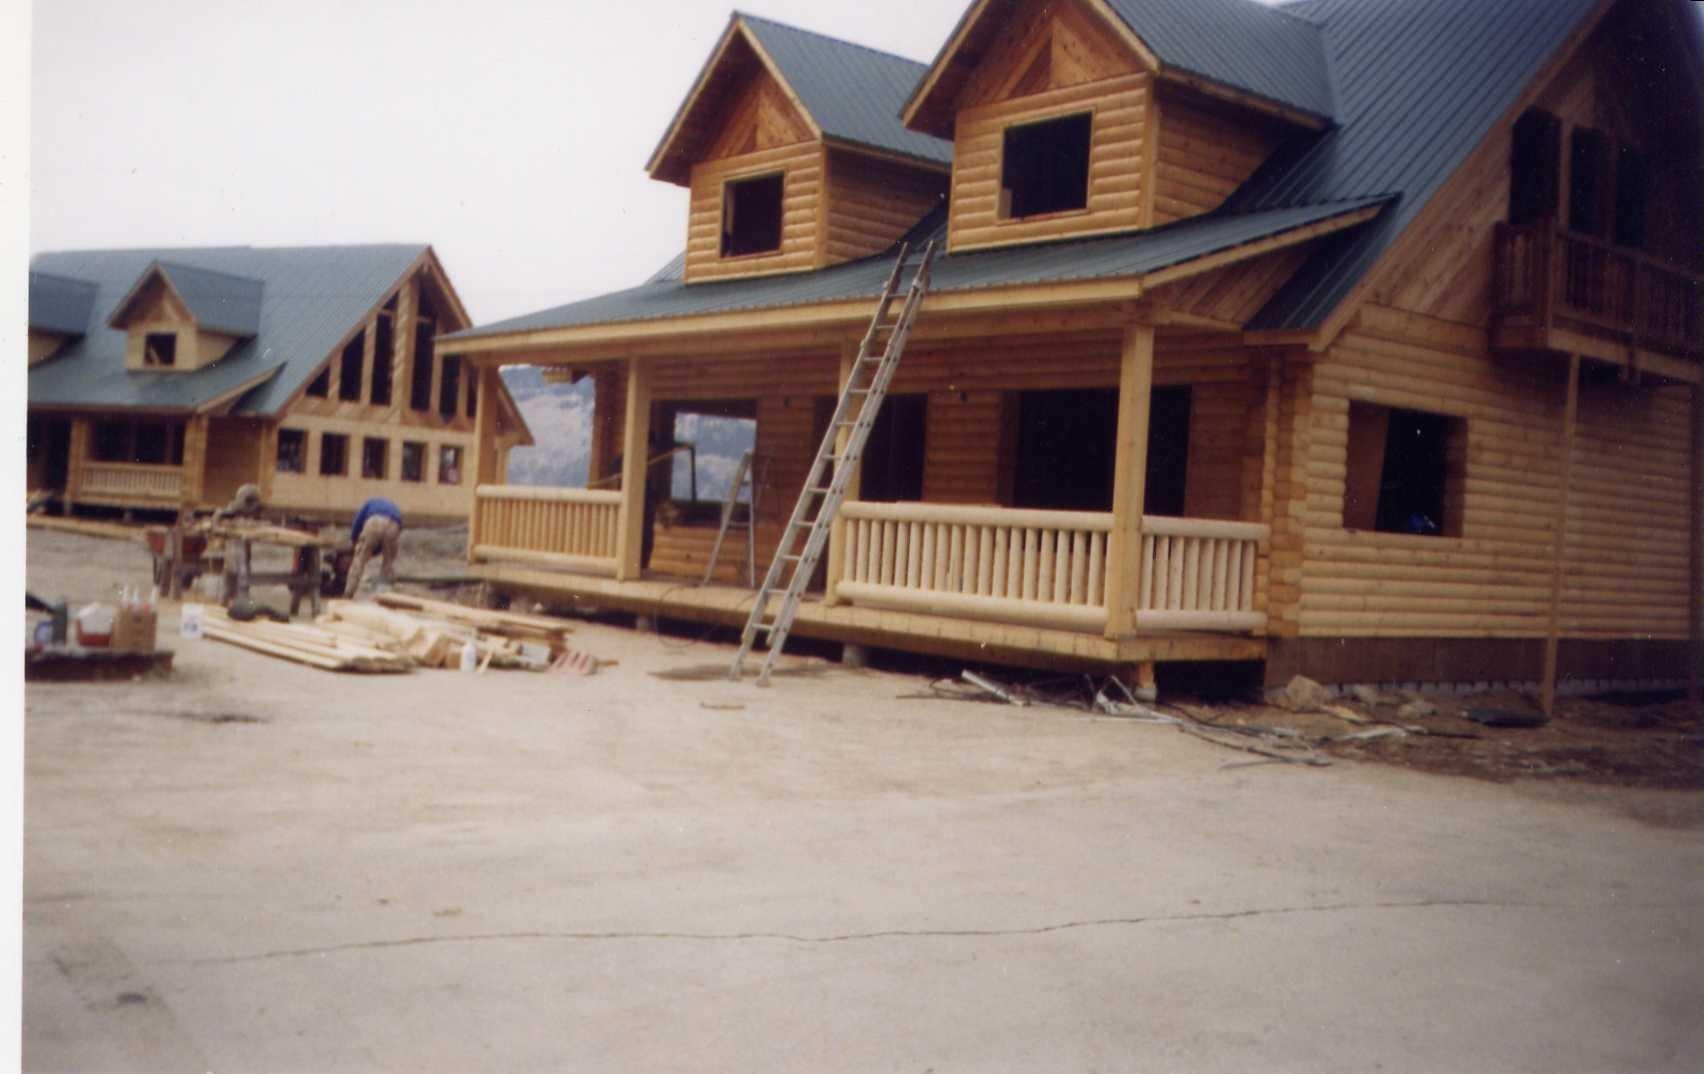 Roofing Complete - railings / trim